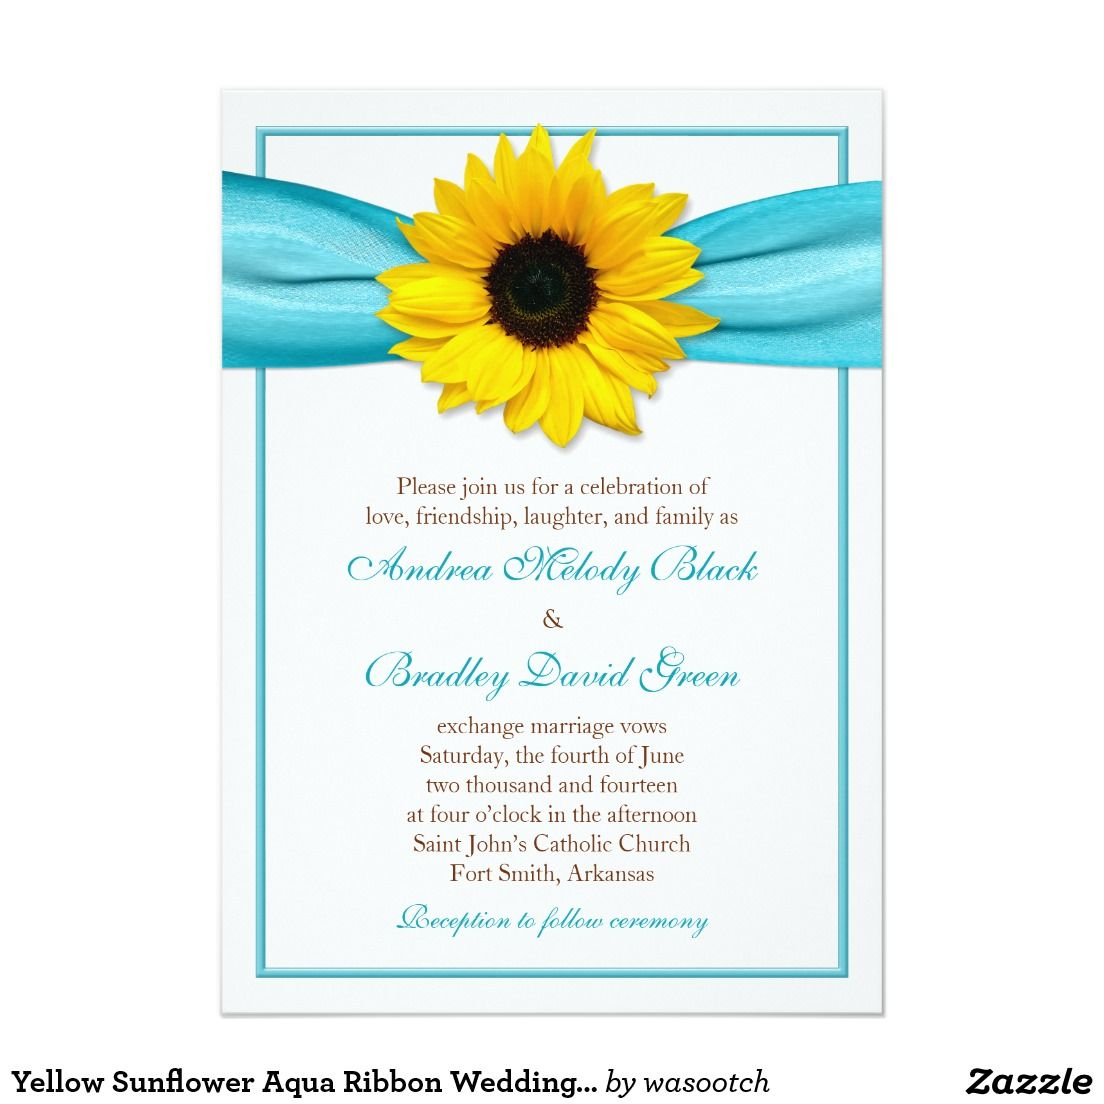 "yellow sunflower aqua ribbon wedding invitation "" x "" invitation, invitation samples"